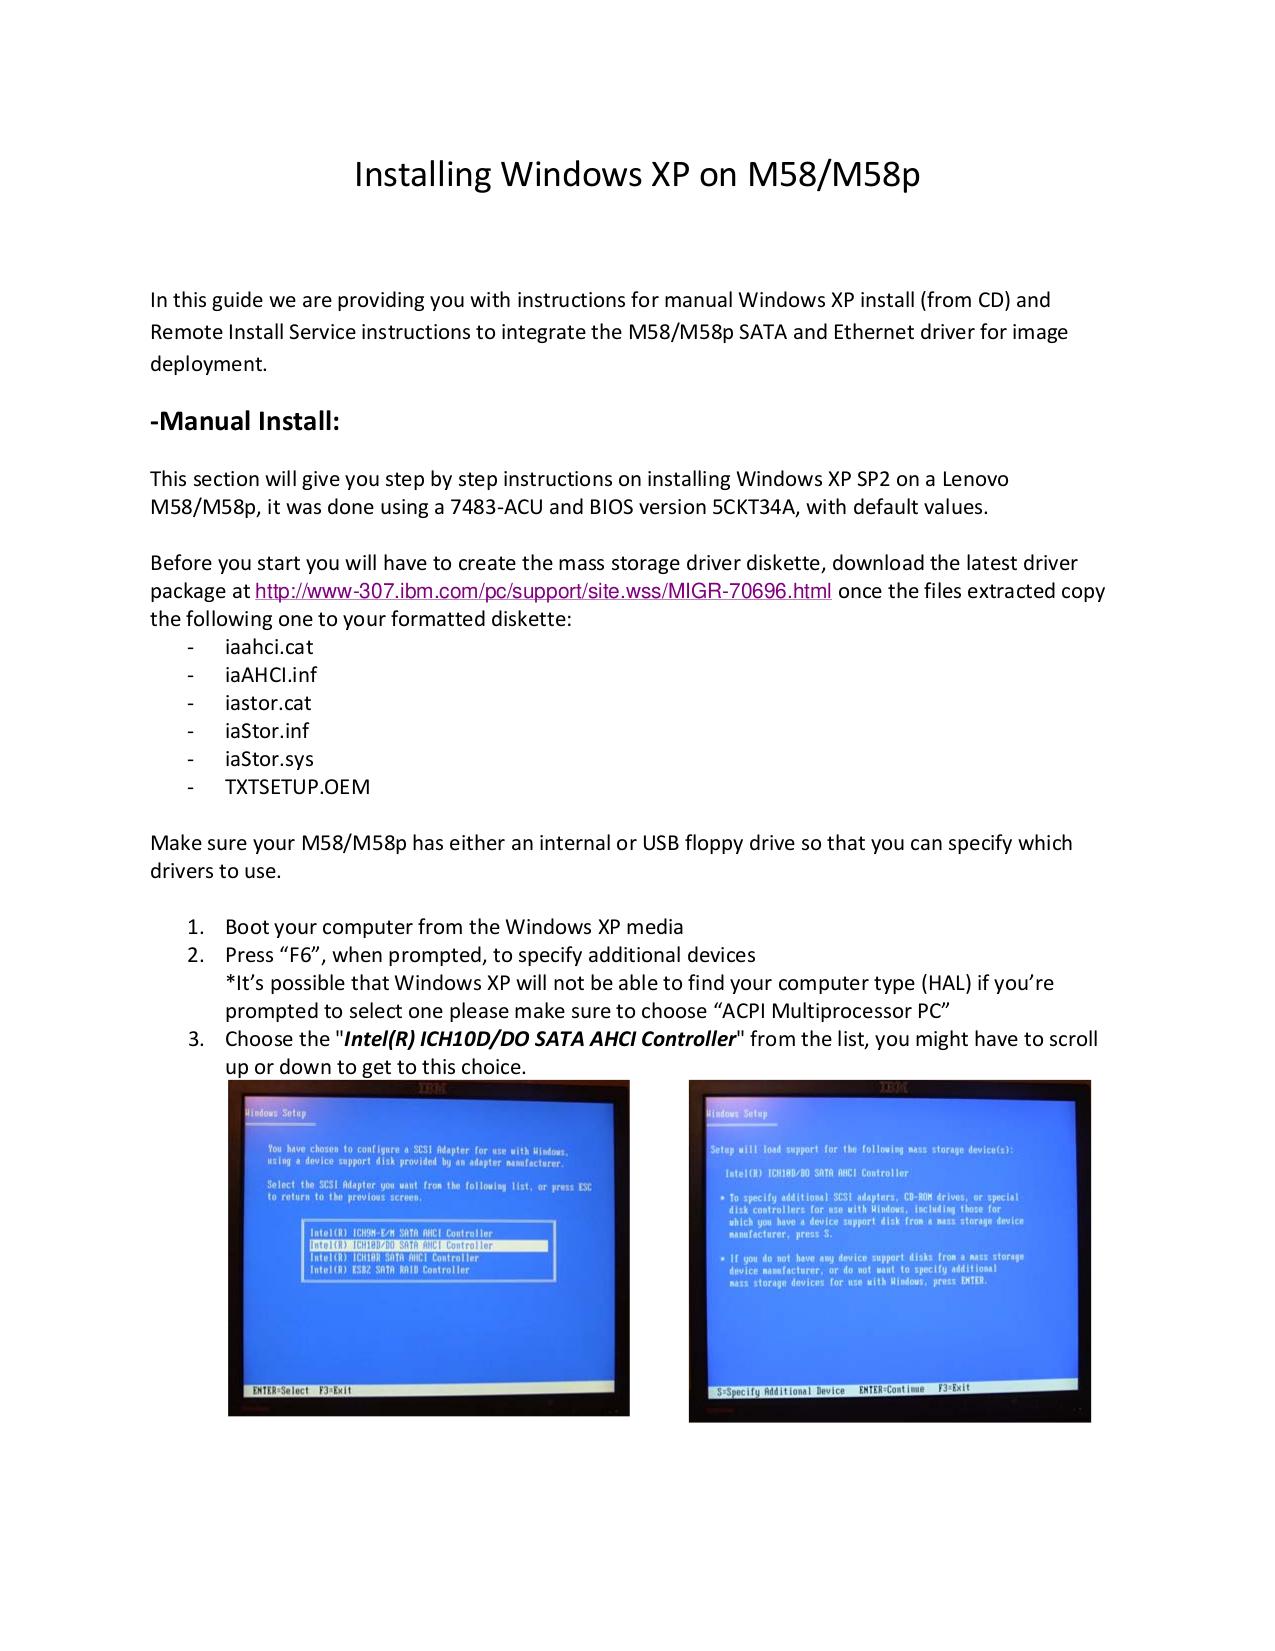 pdf for Lenovo Desktop ThinkCentre M58 3231 manual